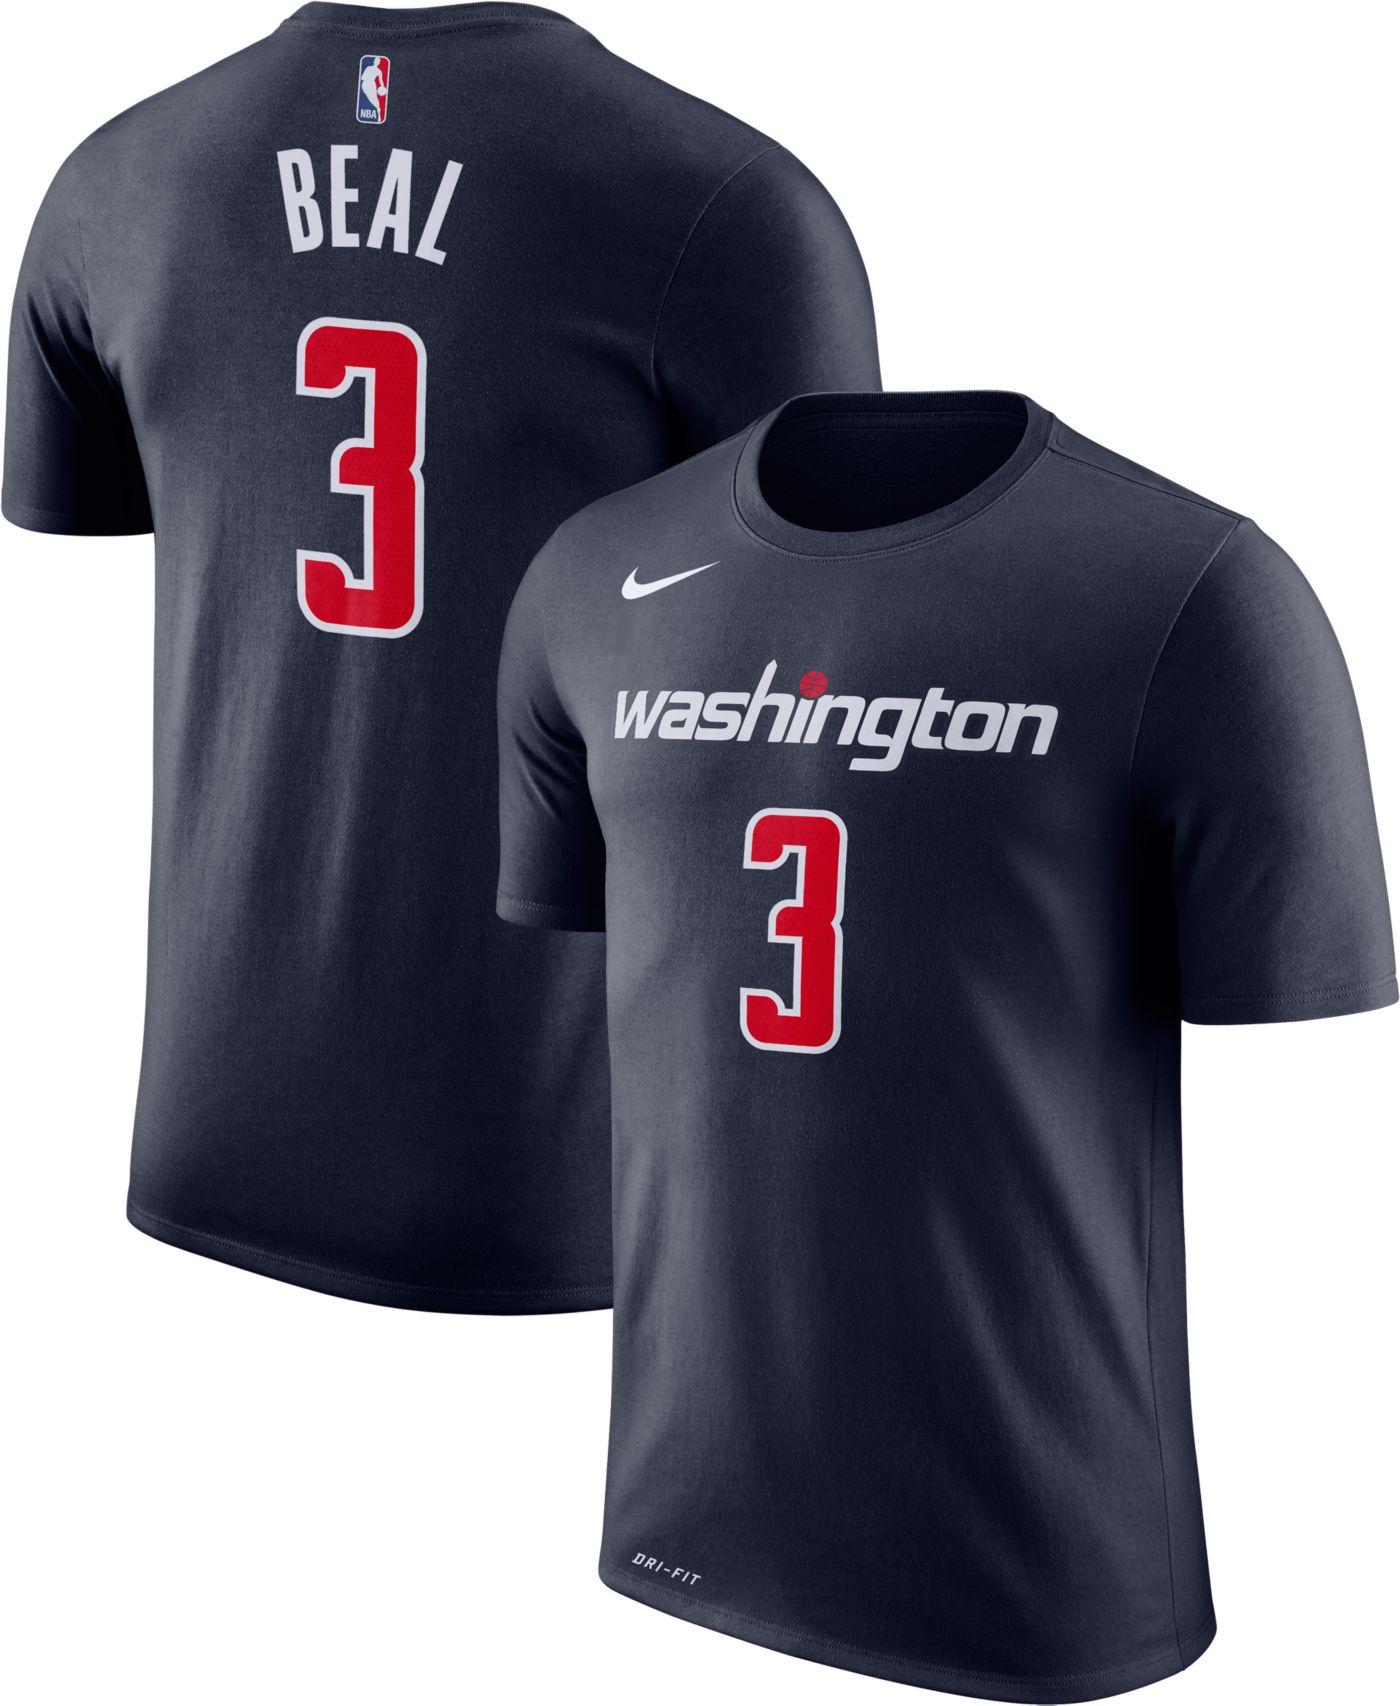 Nike Men's Washington Wizards Bradley Beal #3 Dri-FIT Statement Navy T-Shirt